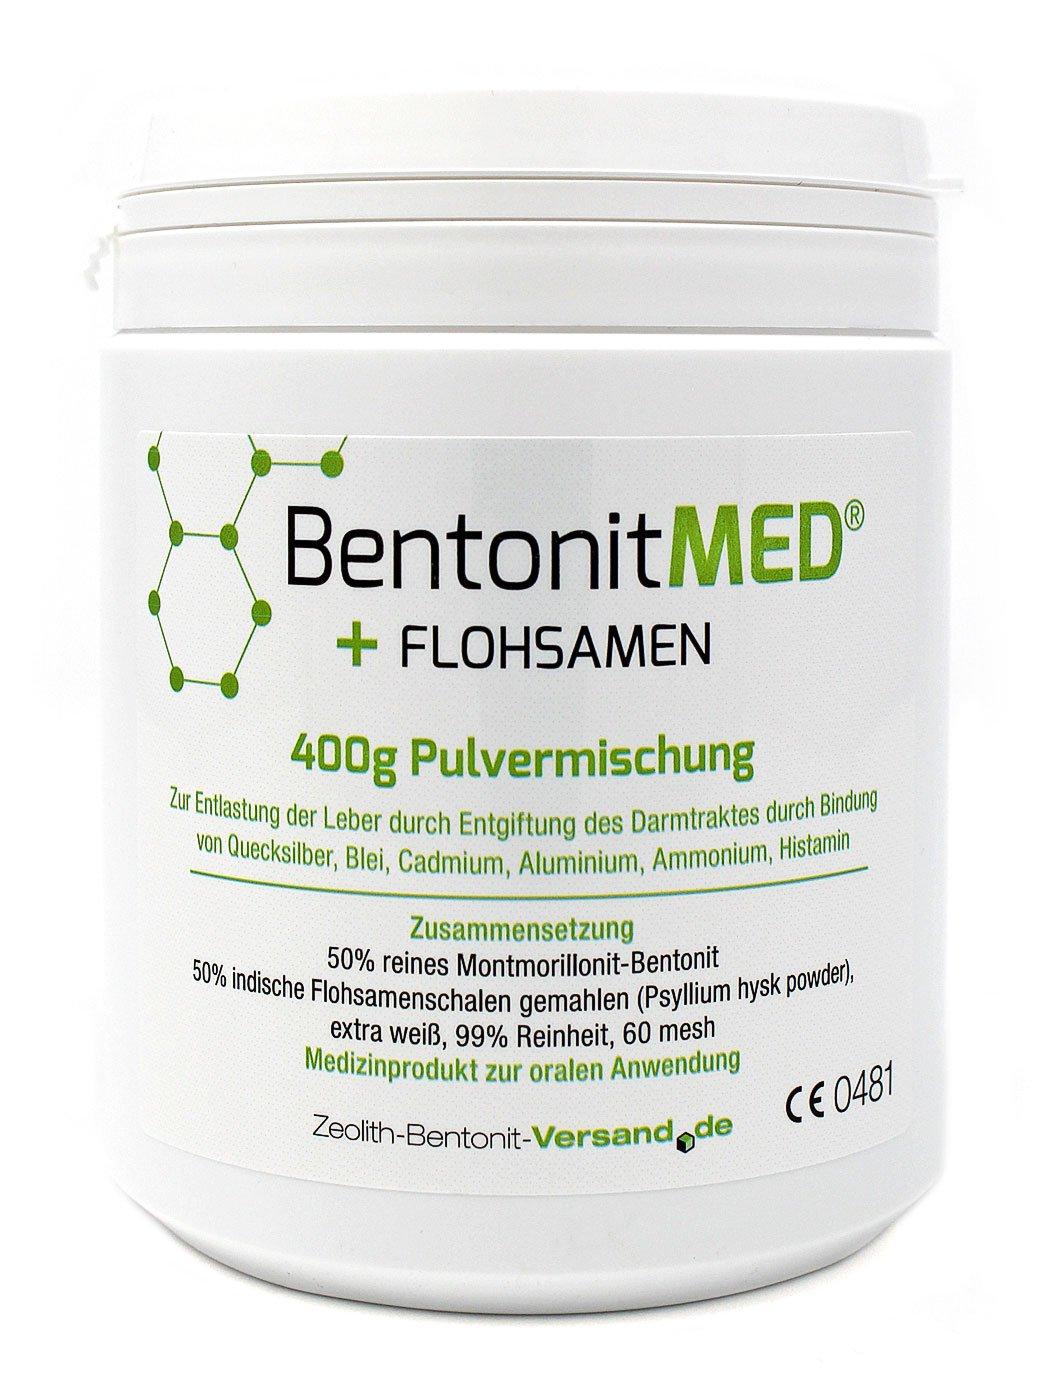 Bentonit MED + Flohsamen Pulvermischung 400 g